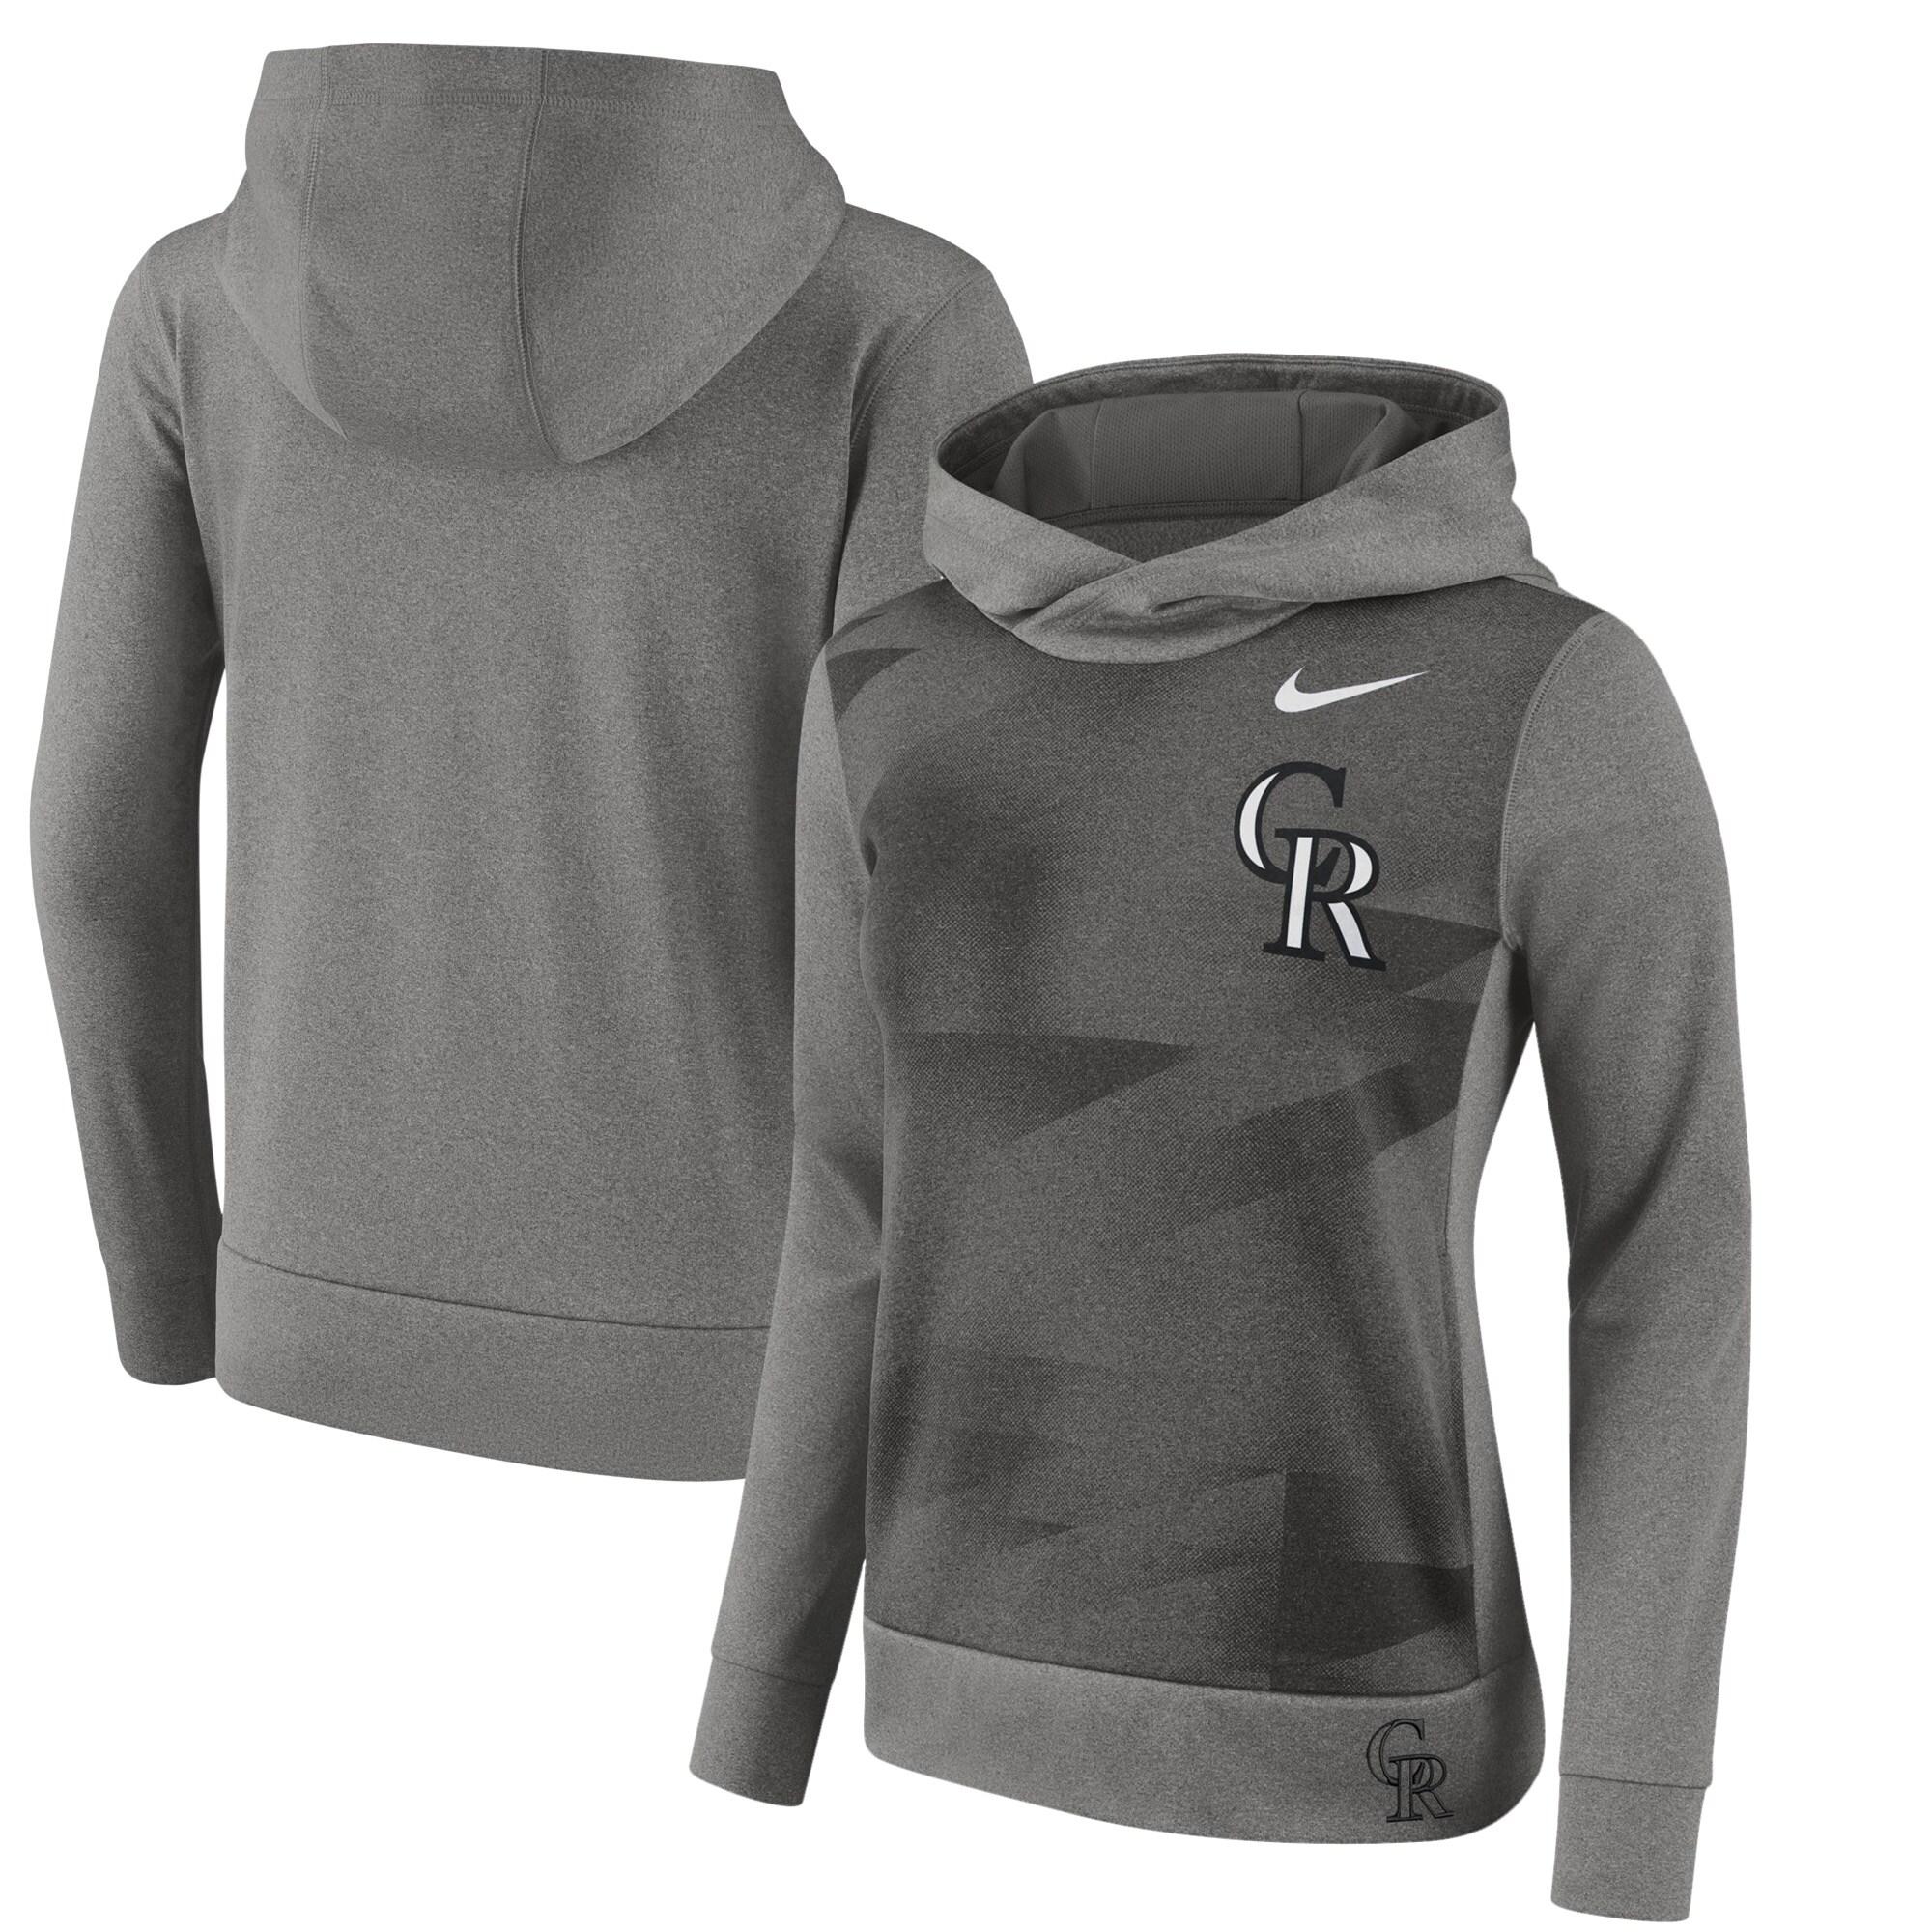 Colorado Rockies Nike Women's Performance Pullover Hoodie - Gray